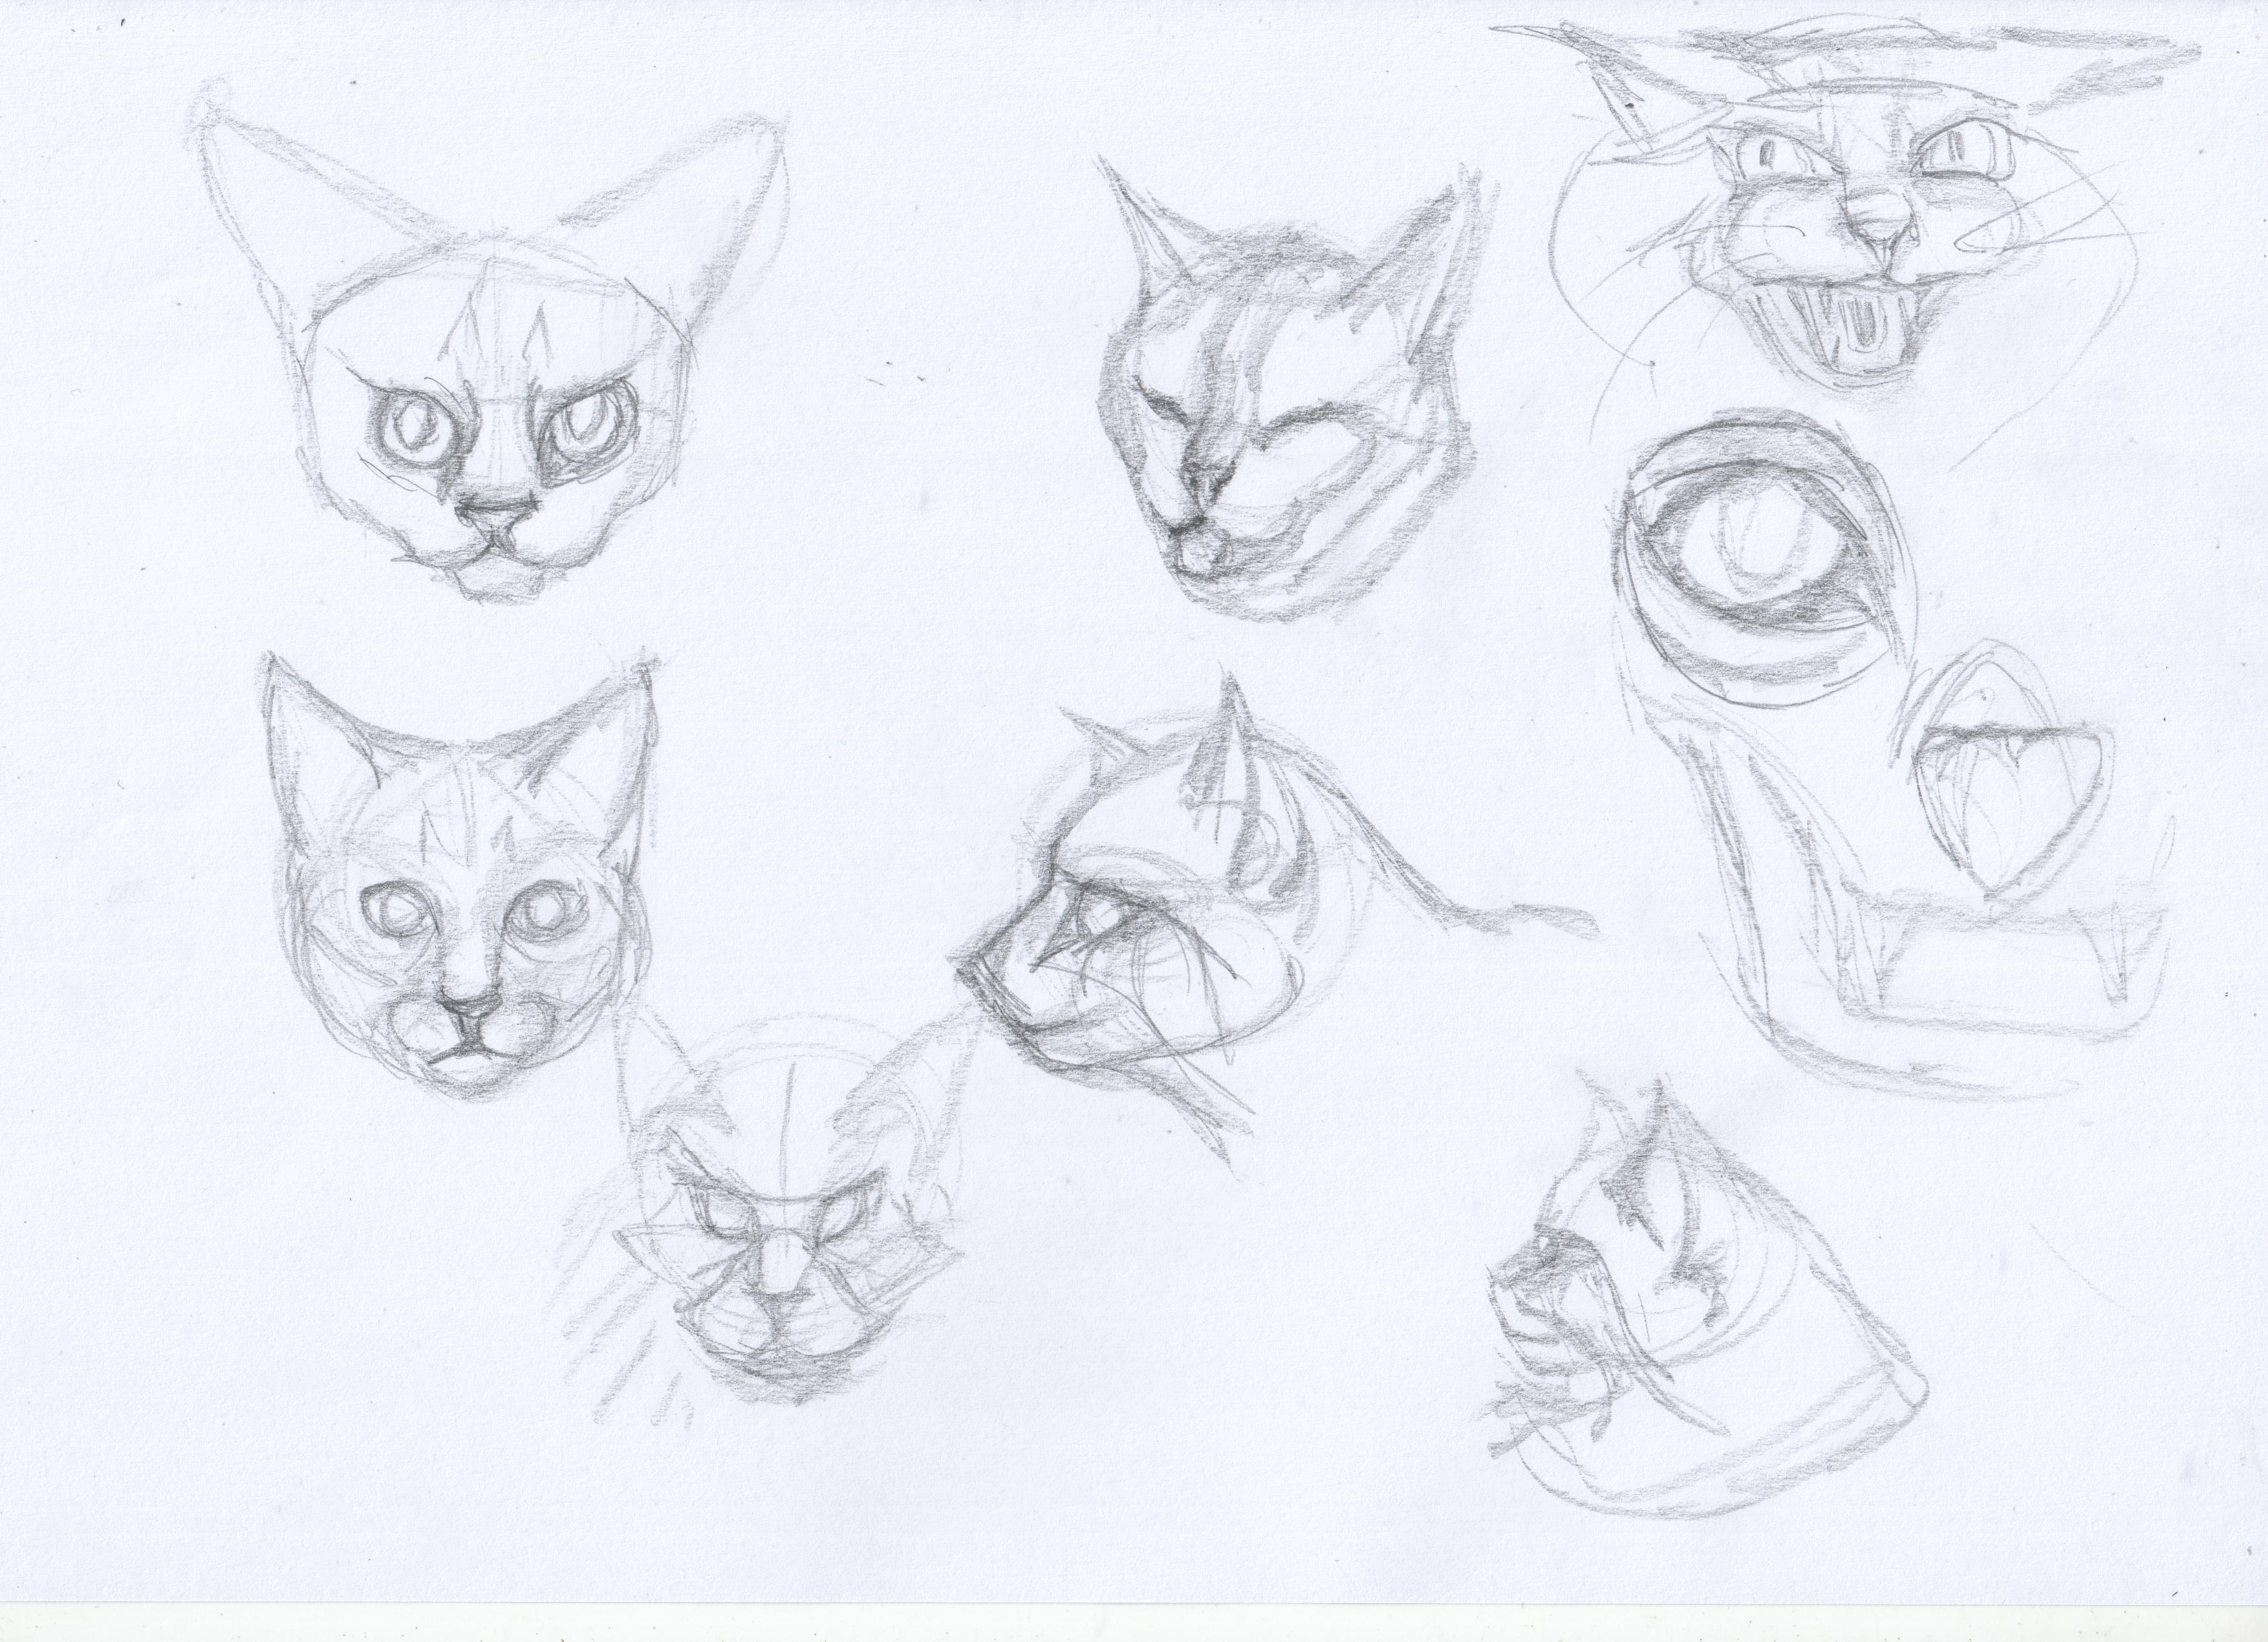 [Image: cat_lesson3_1_by_punk_a_cat-d9262ys.jpg]